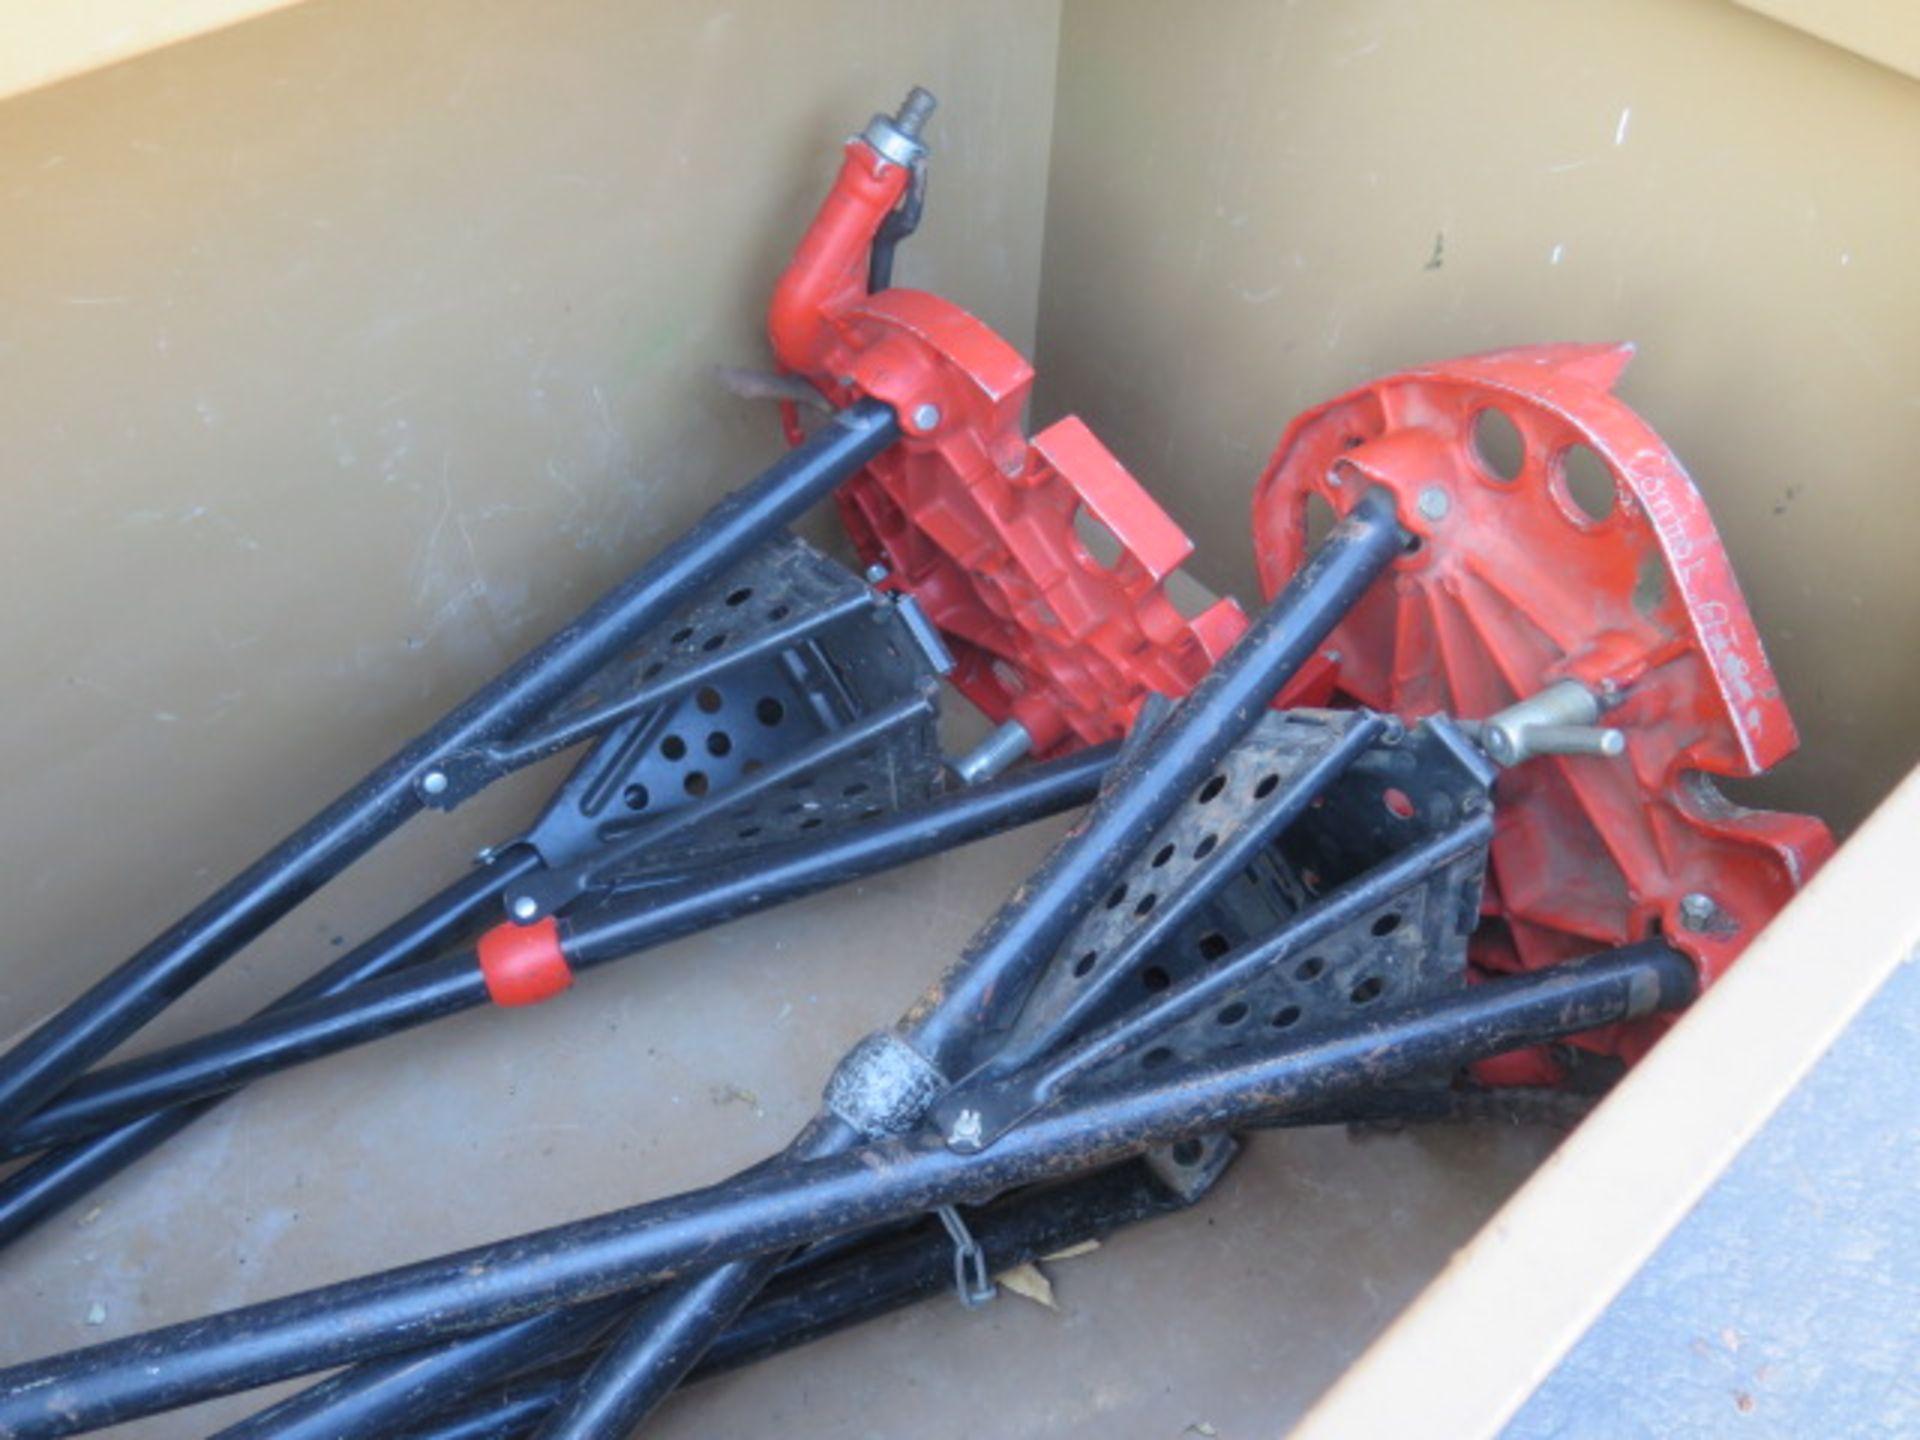 Knaack mdl. 89 Storagemaster Rolling Job Box w/ Ridgid Tri-Stands (SOLD AS-IS - NO WARRANTY) - Image 9 of 11